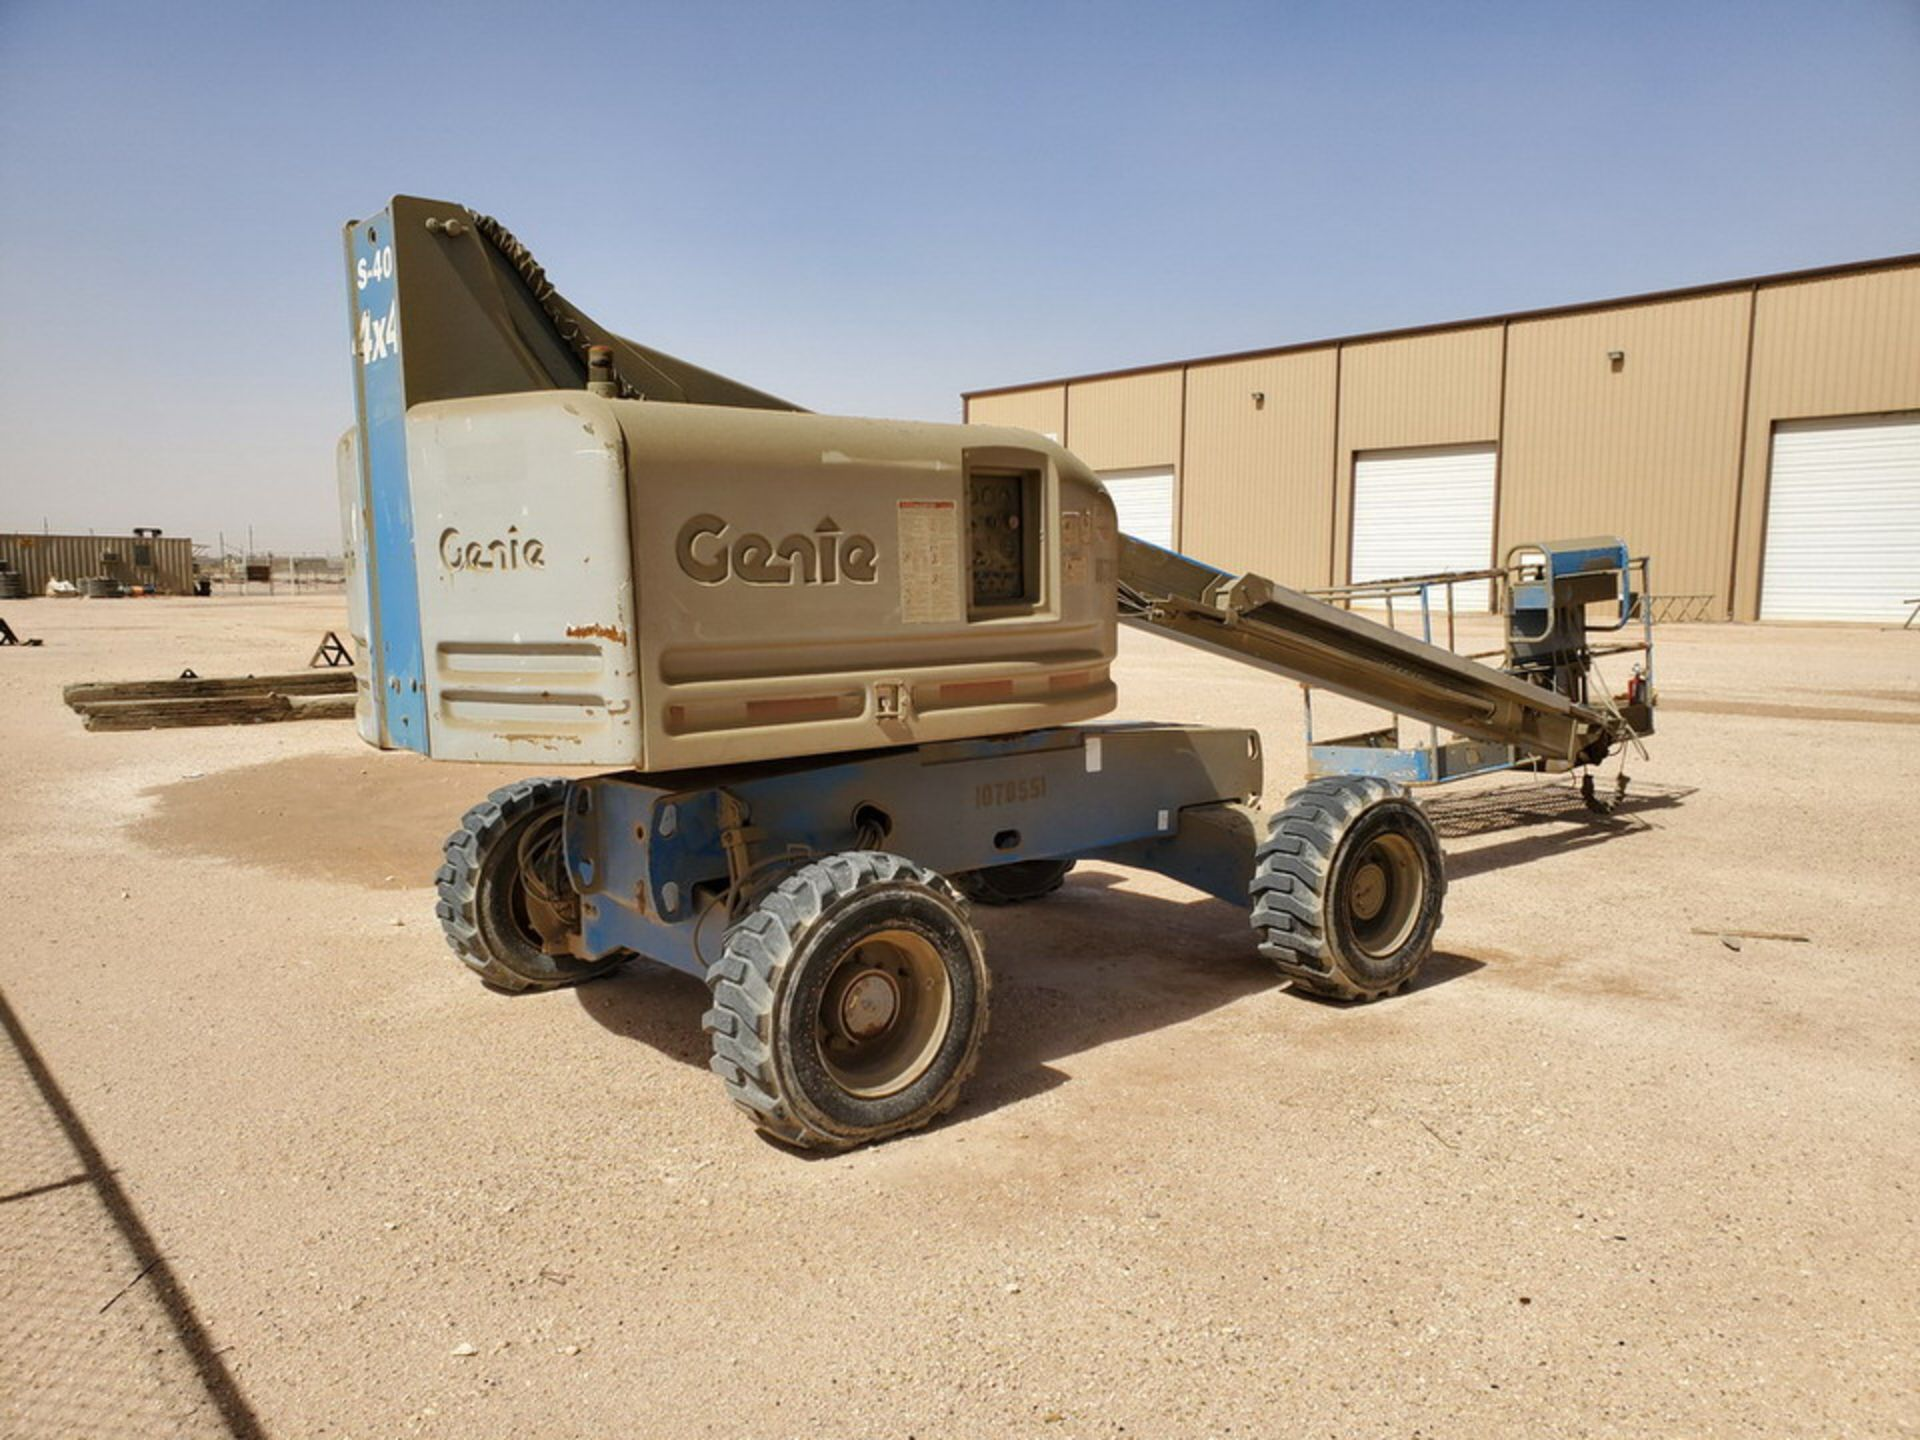 Genie 4x4 S-40 Telescopic Boom Lift 5,611 hrs - Image 5 of 14